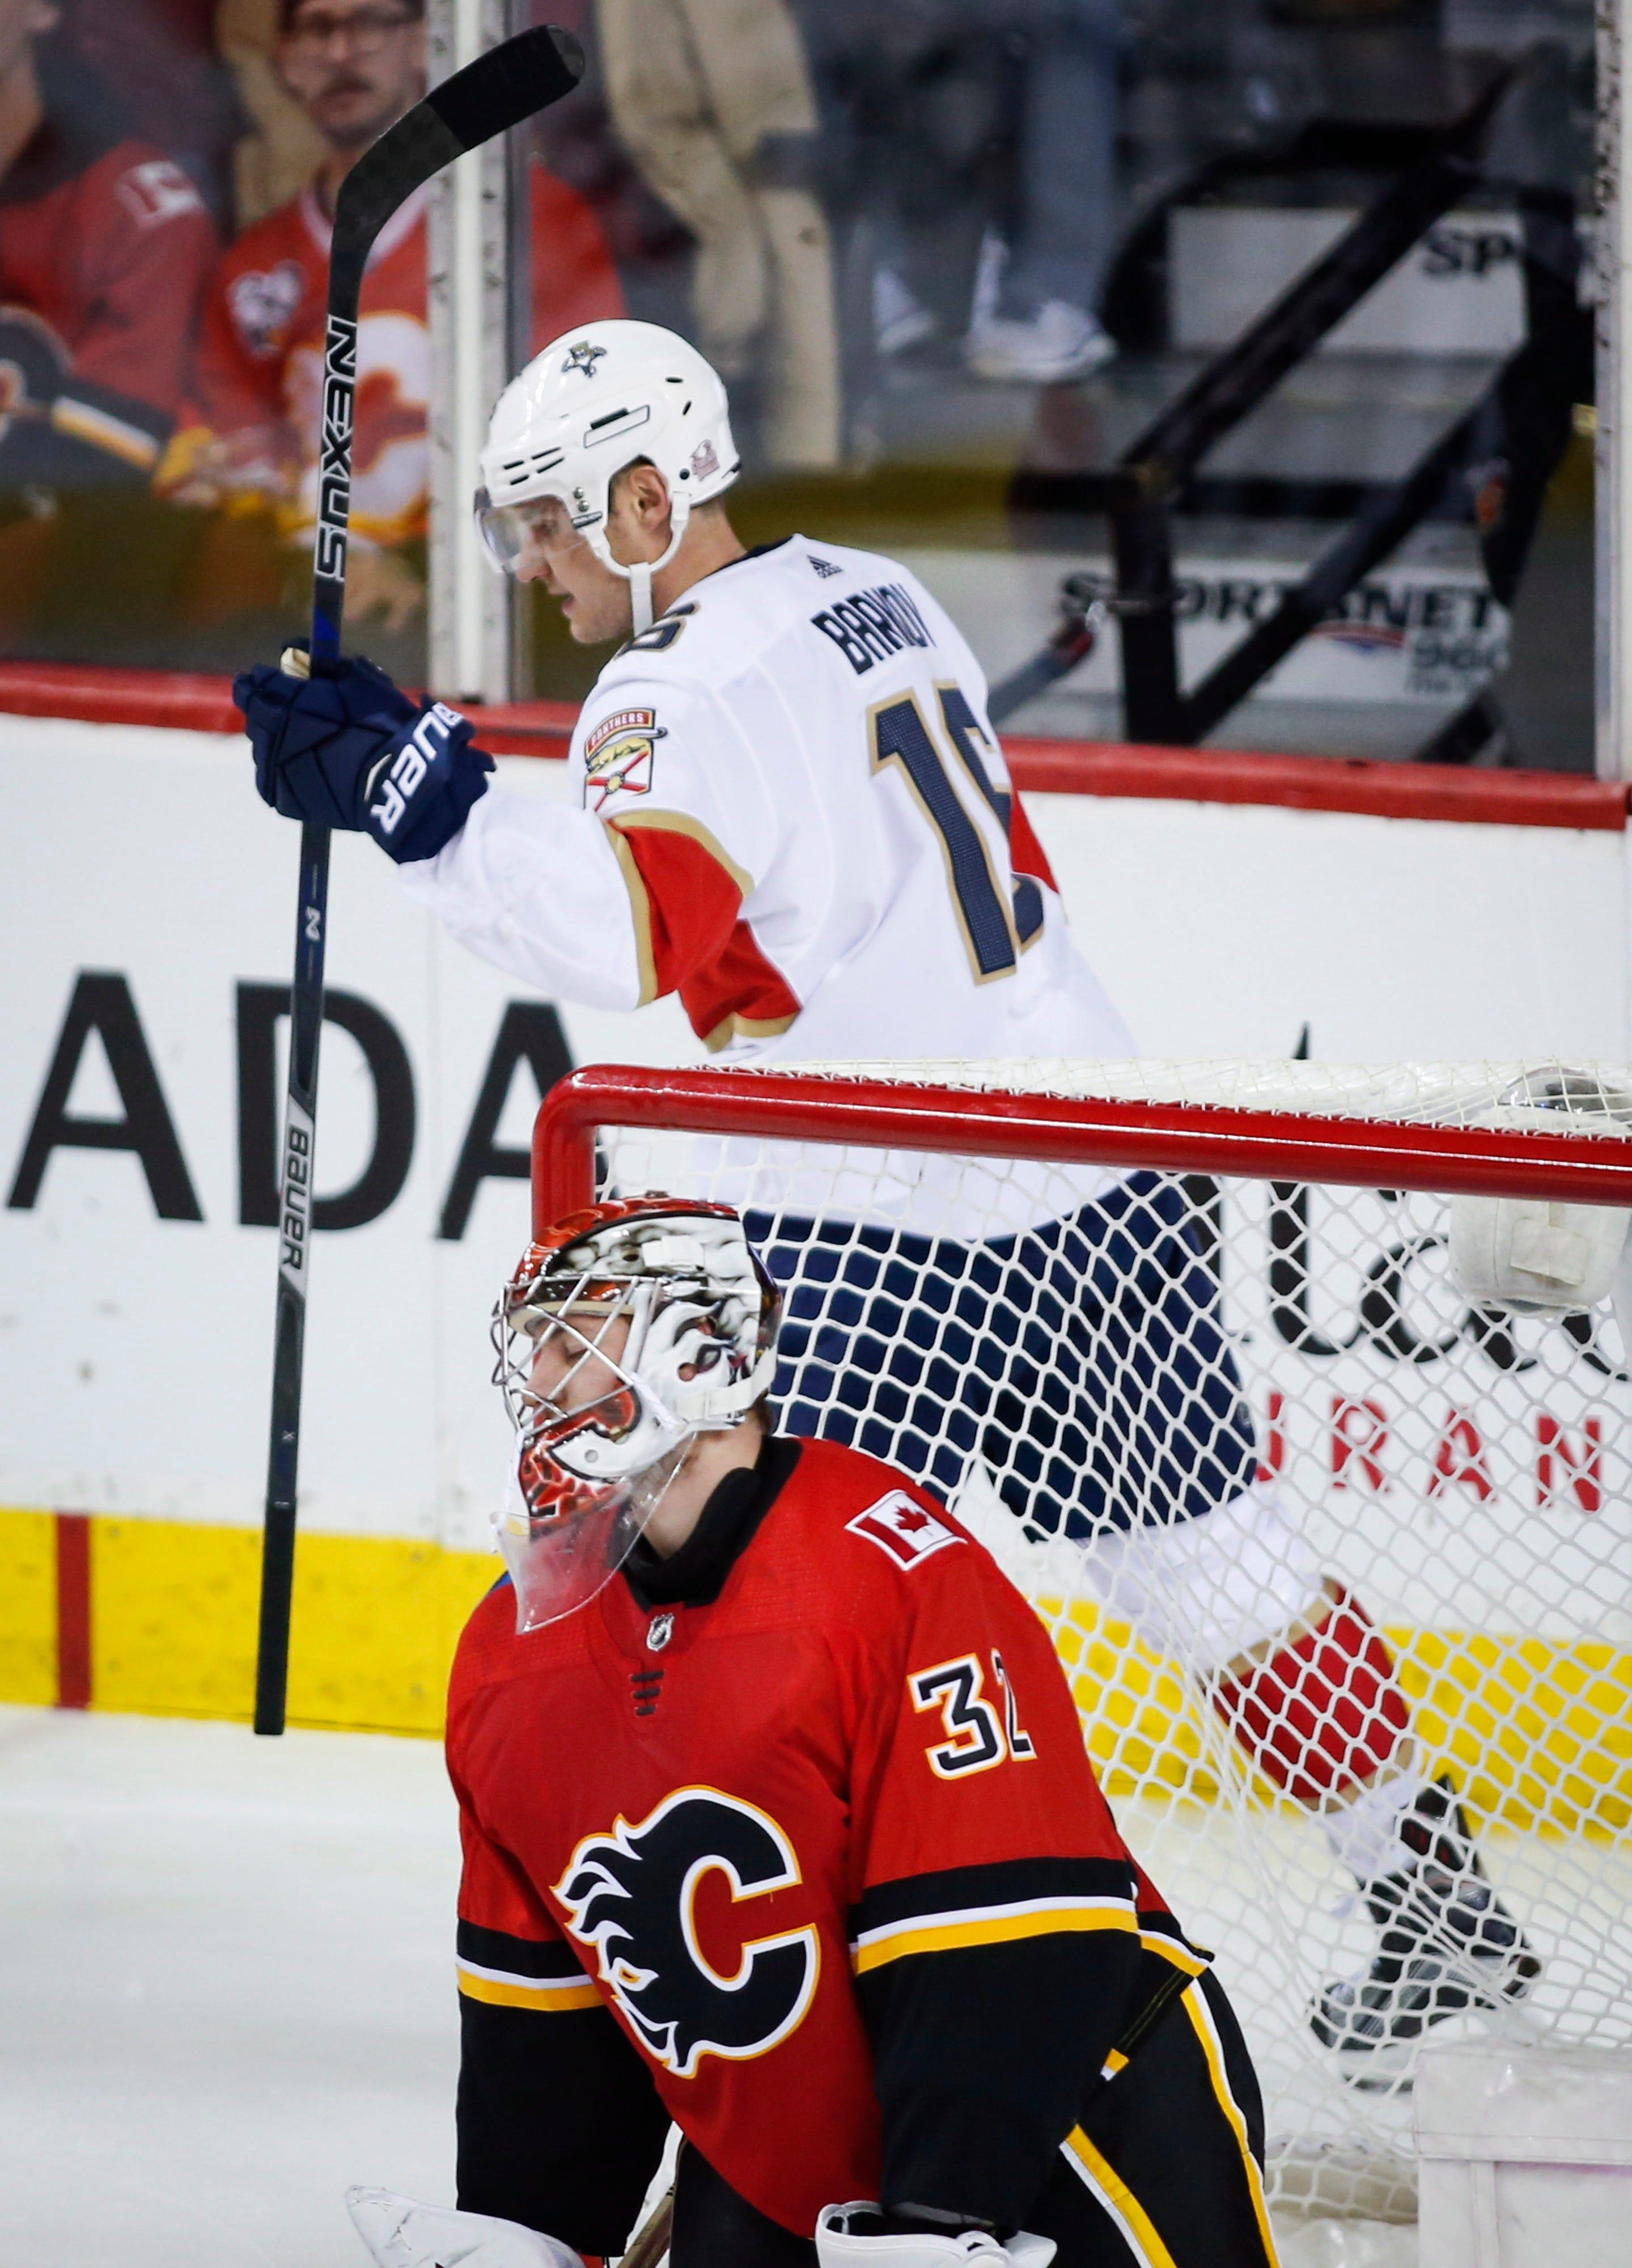 Luongo returns, Matheson scores 2 as Panthers beat Flames